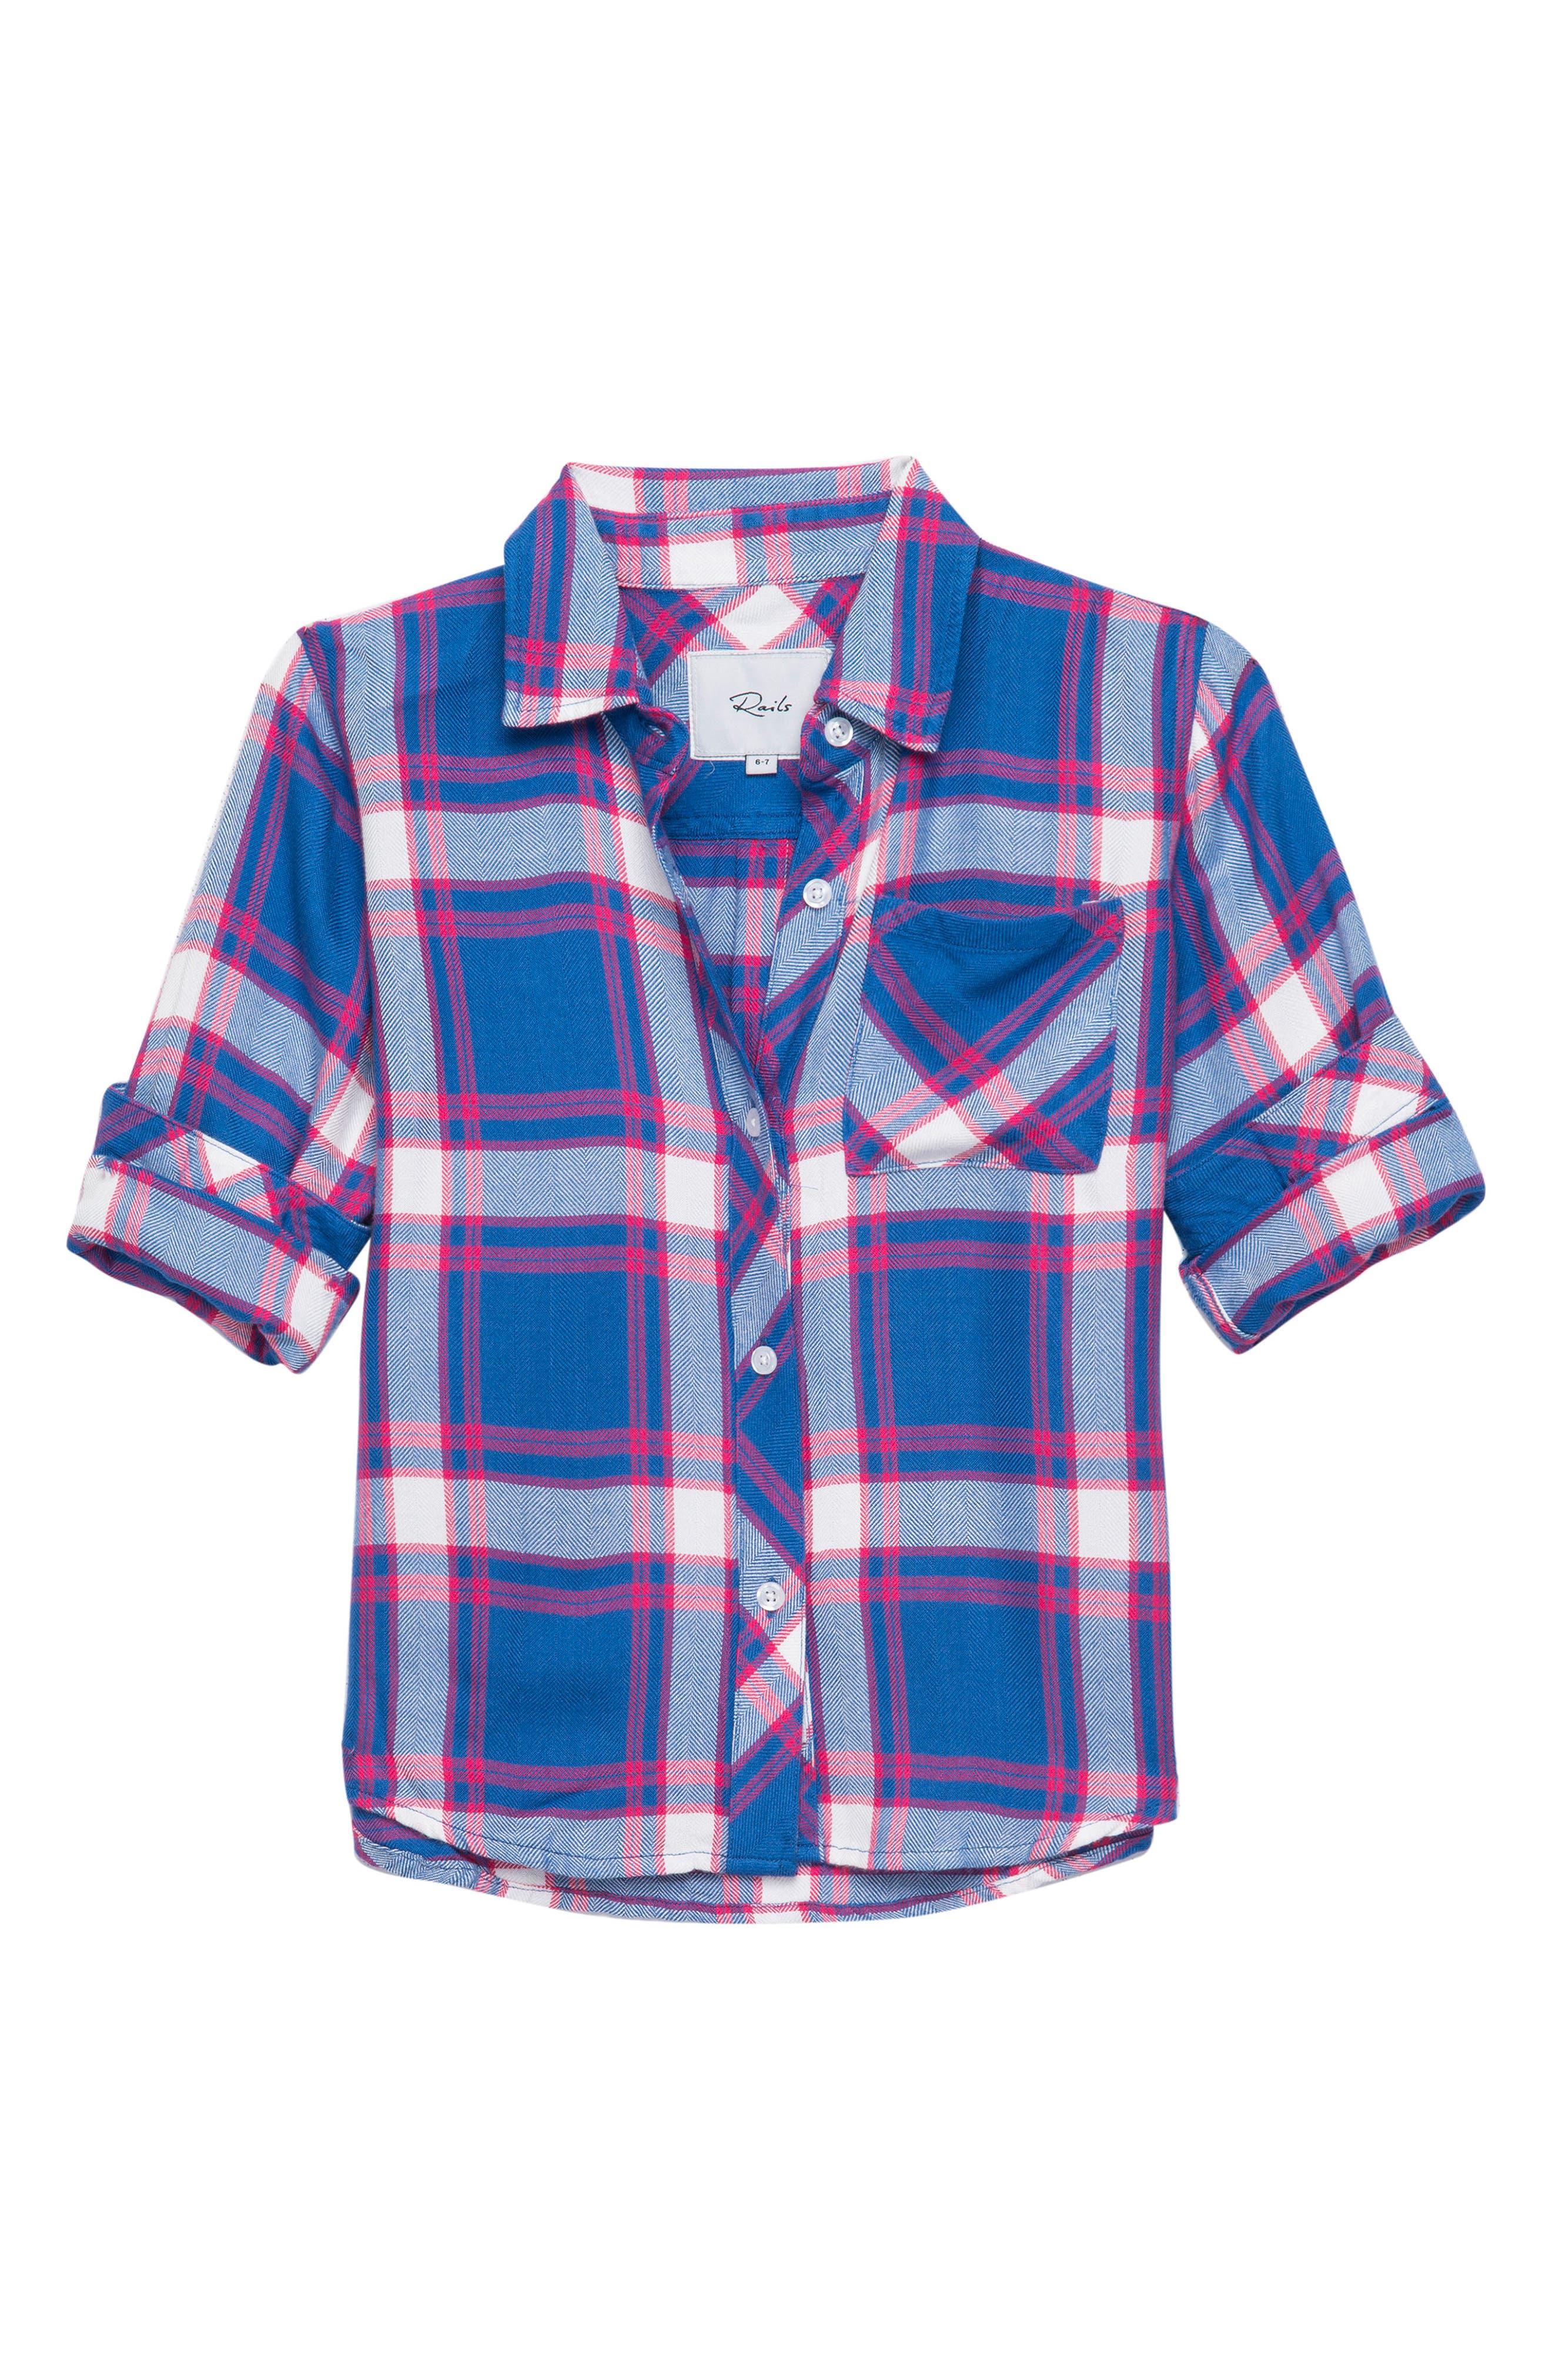 Hudson Plaid Shirt,                             Main thumbnail 1, color,                             Ruby Sky White